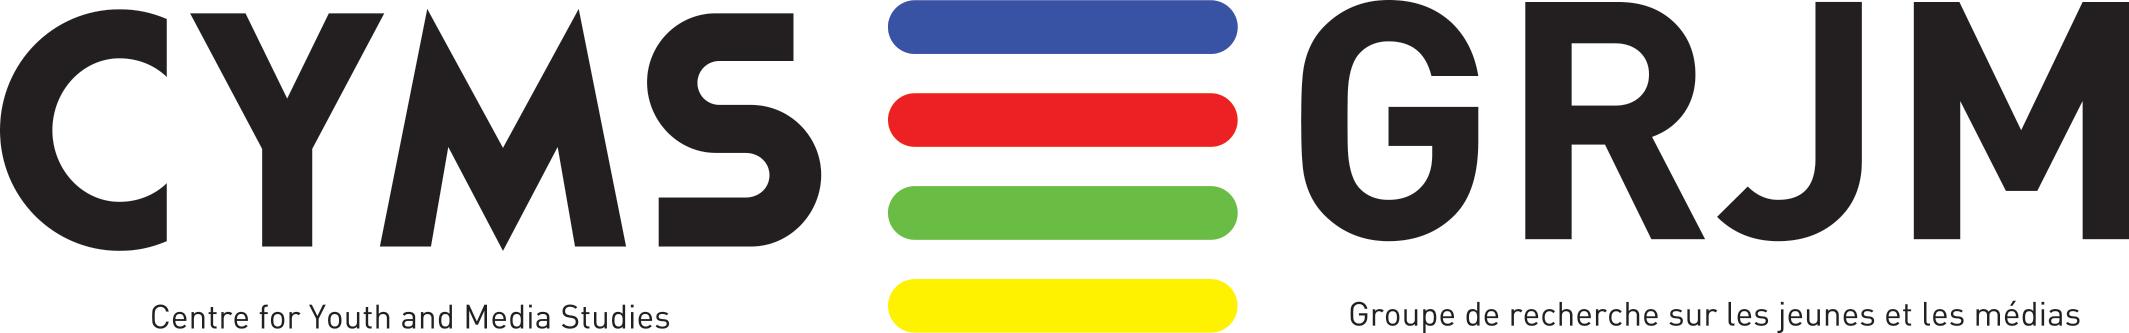 grjm_logo_2013